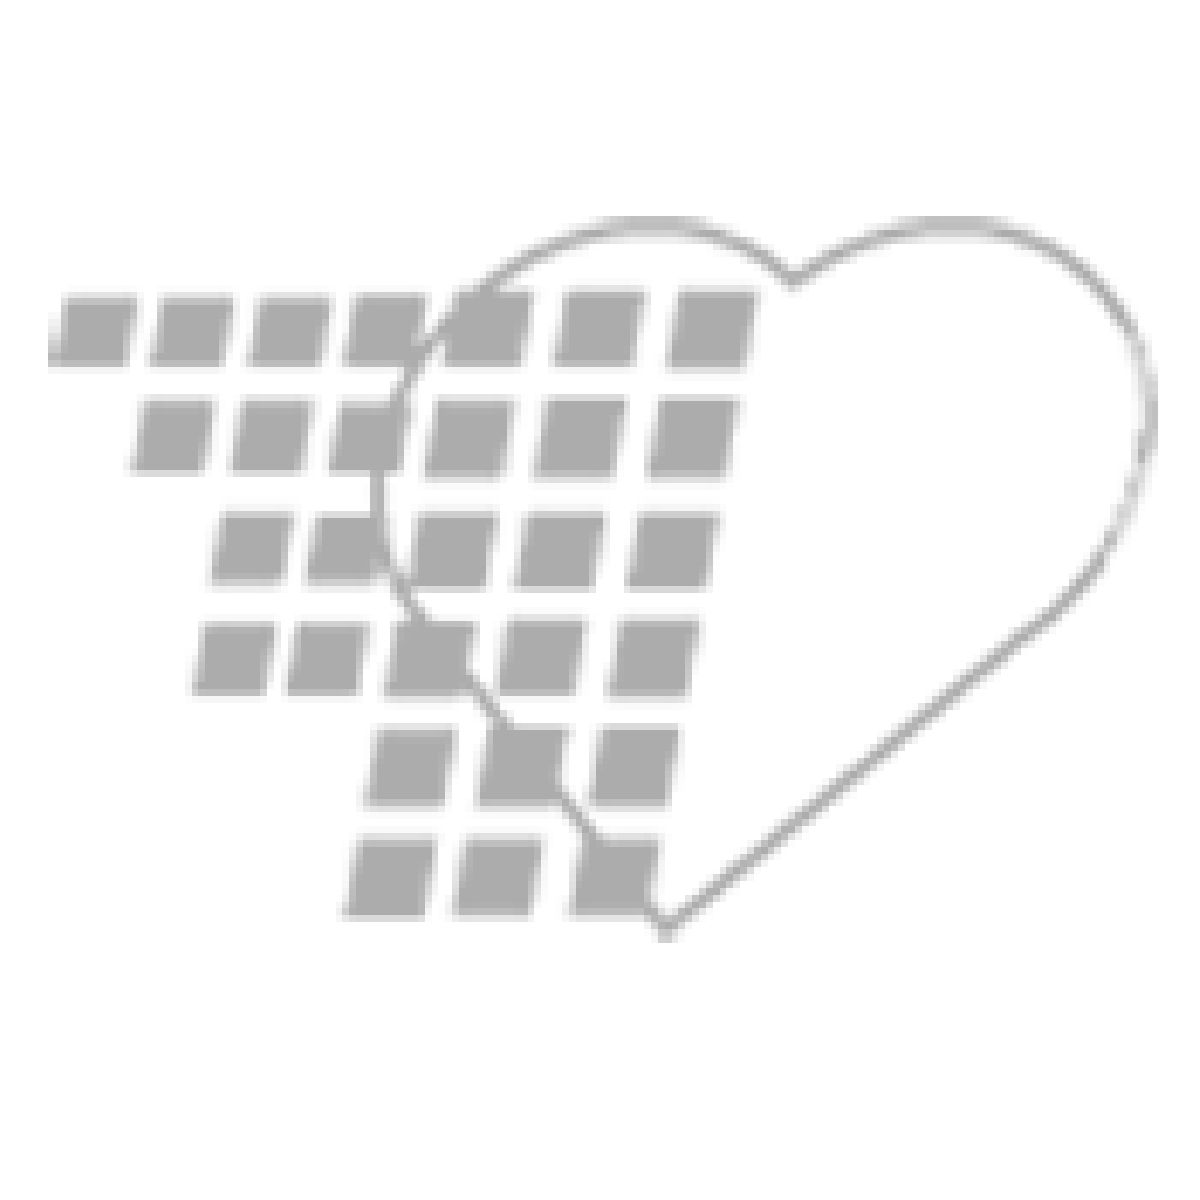 02-92-0047 - Goniometer